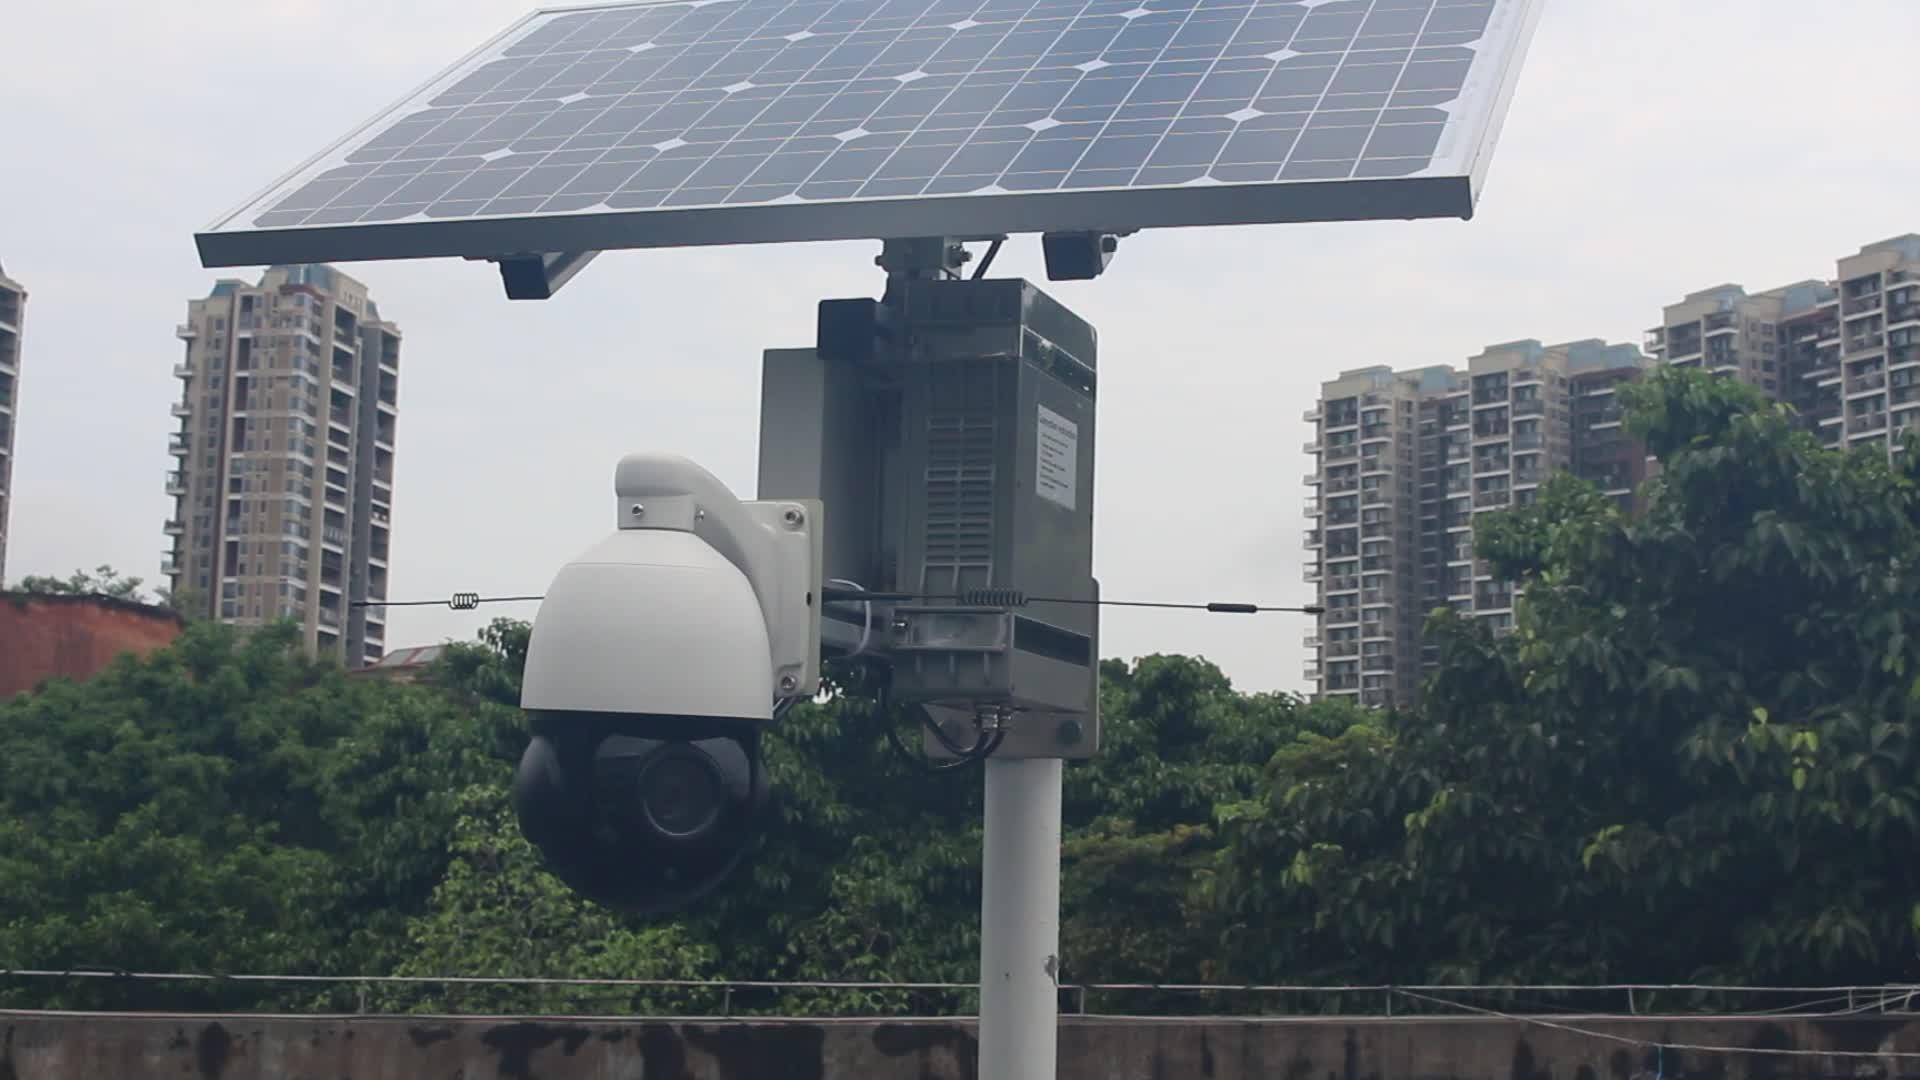 Güneş enerjisi cctv kamera sistemi açık kablosuz wifi 4G / 3g ptz ip kamera